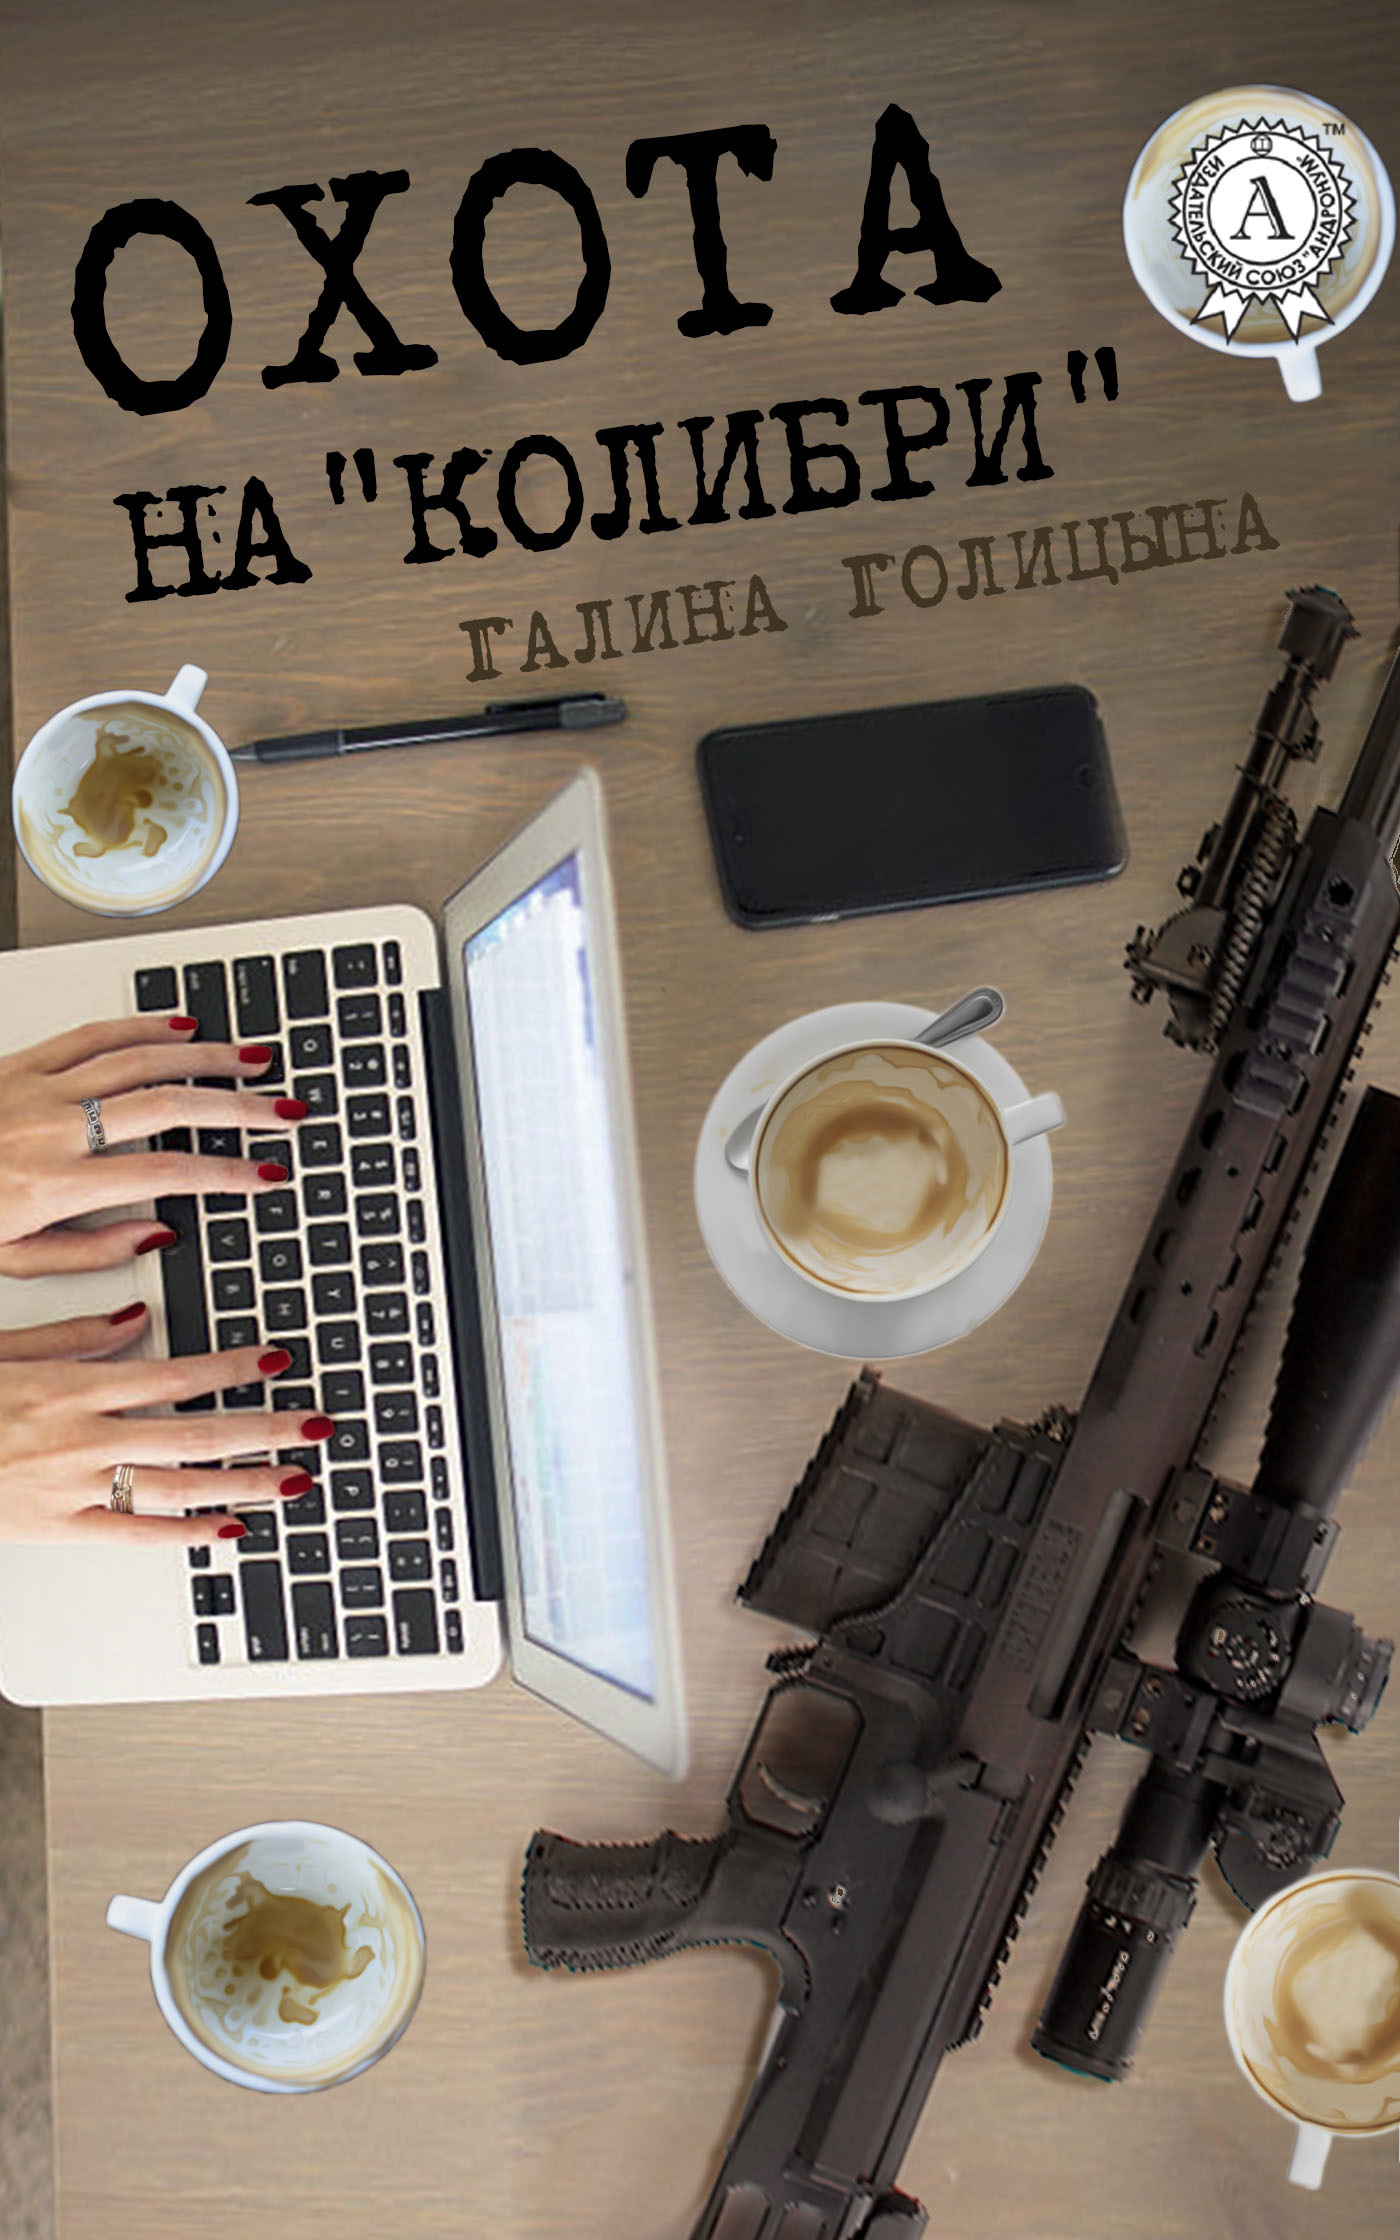 Галина Голицына Охота на «Колибри» галина голицына бомж миллионер